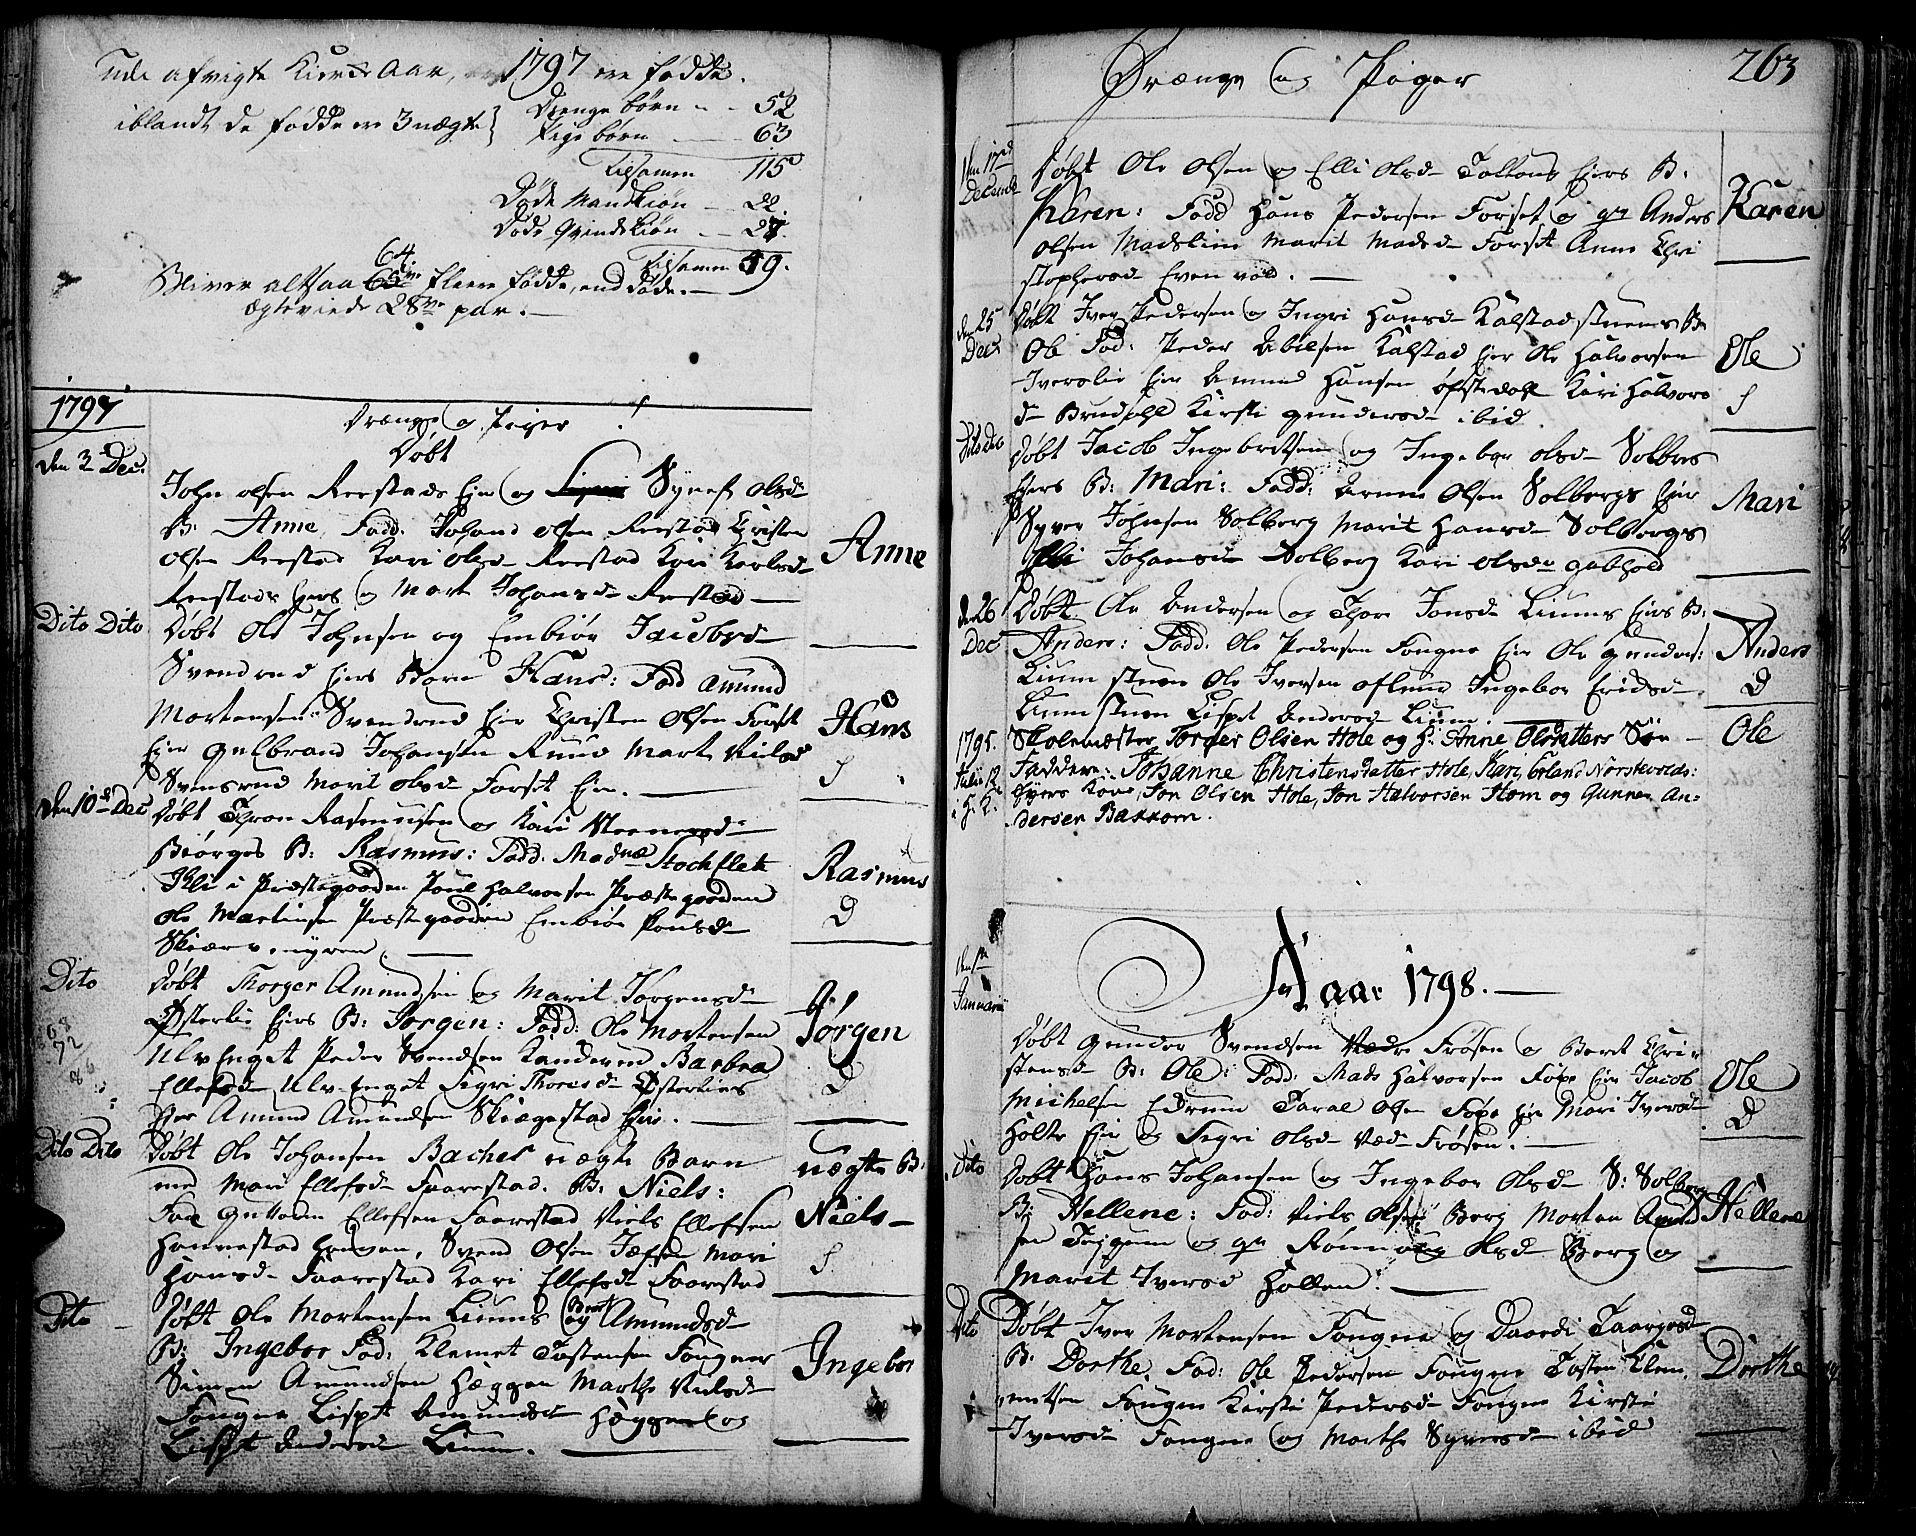 SAH, Gausdal prestekontor, Ministerialbok nr. 3, 1758-1809, s. 263